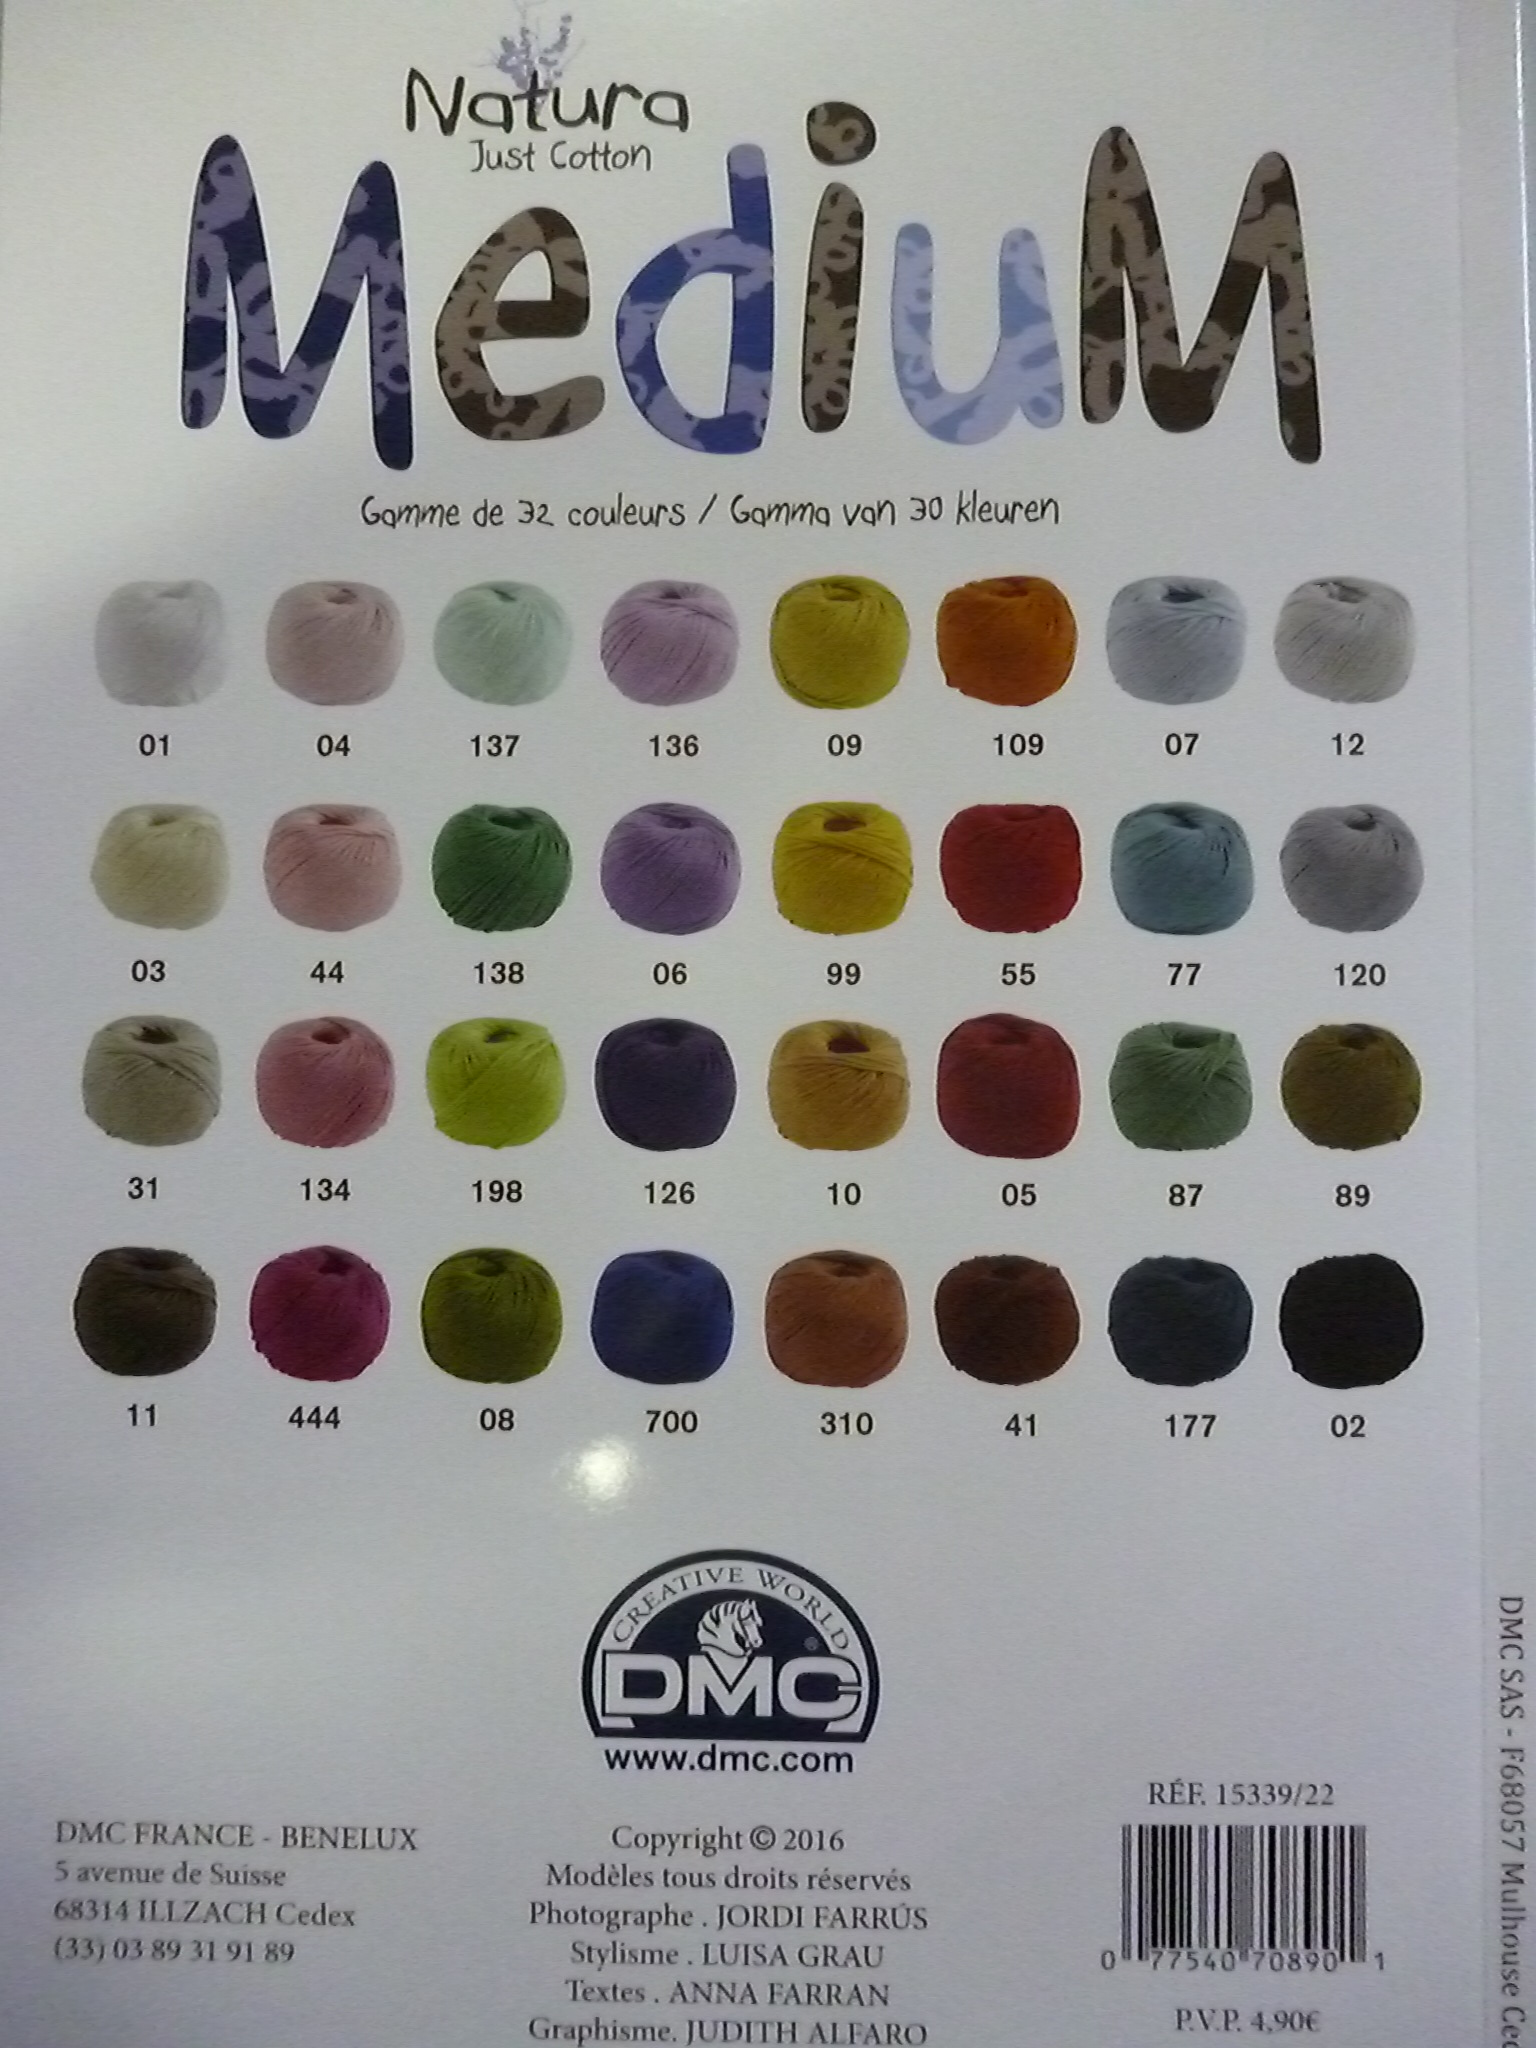 dmc just cotton